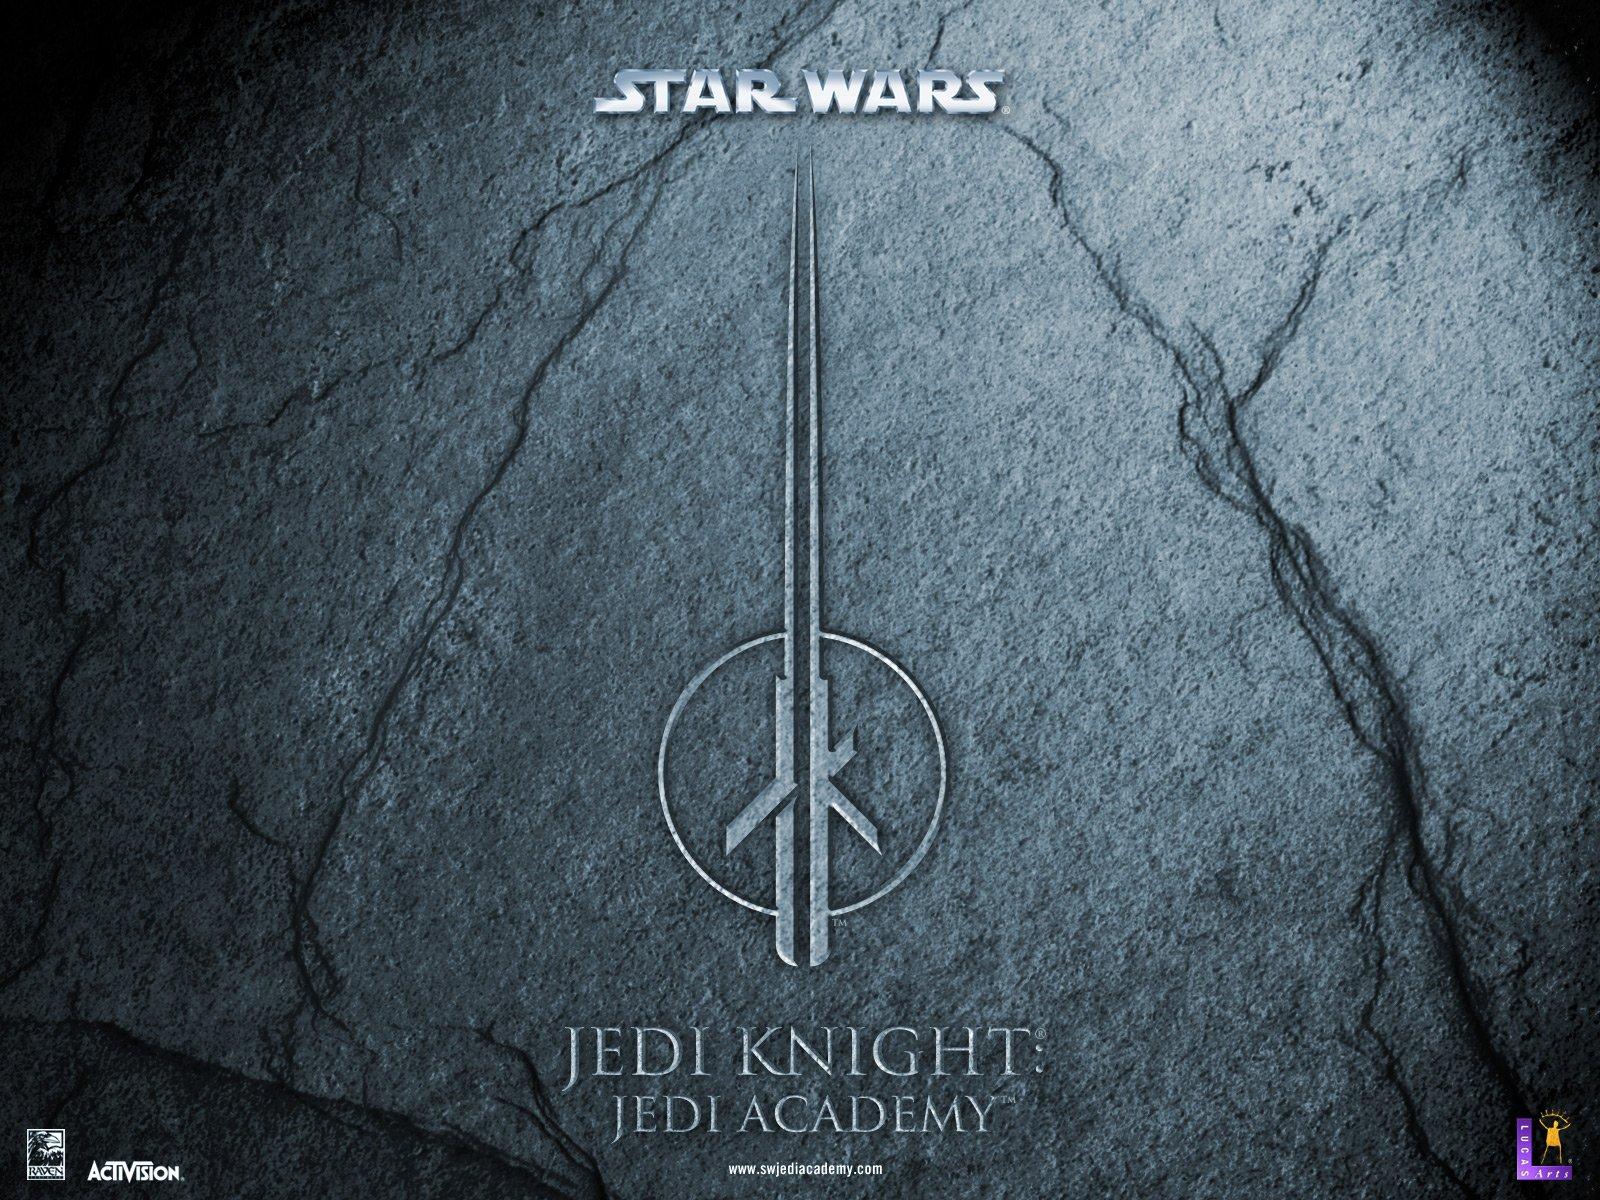 Мультиплеер Star Wars Jedi Knight: Jedi Academy - день 2 - Изображение 1